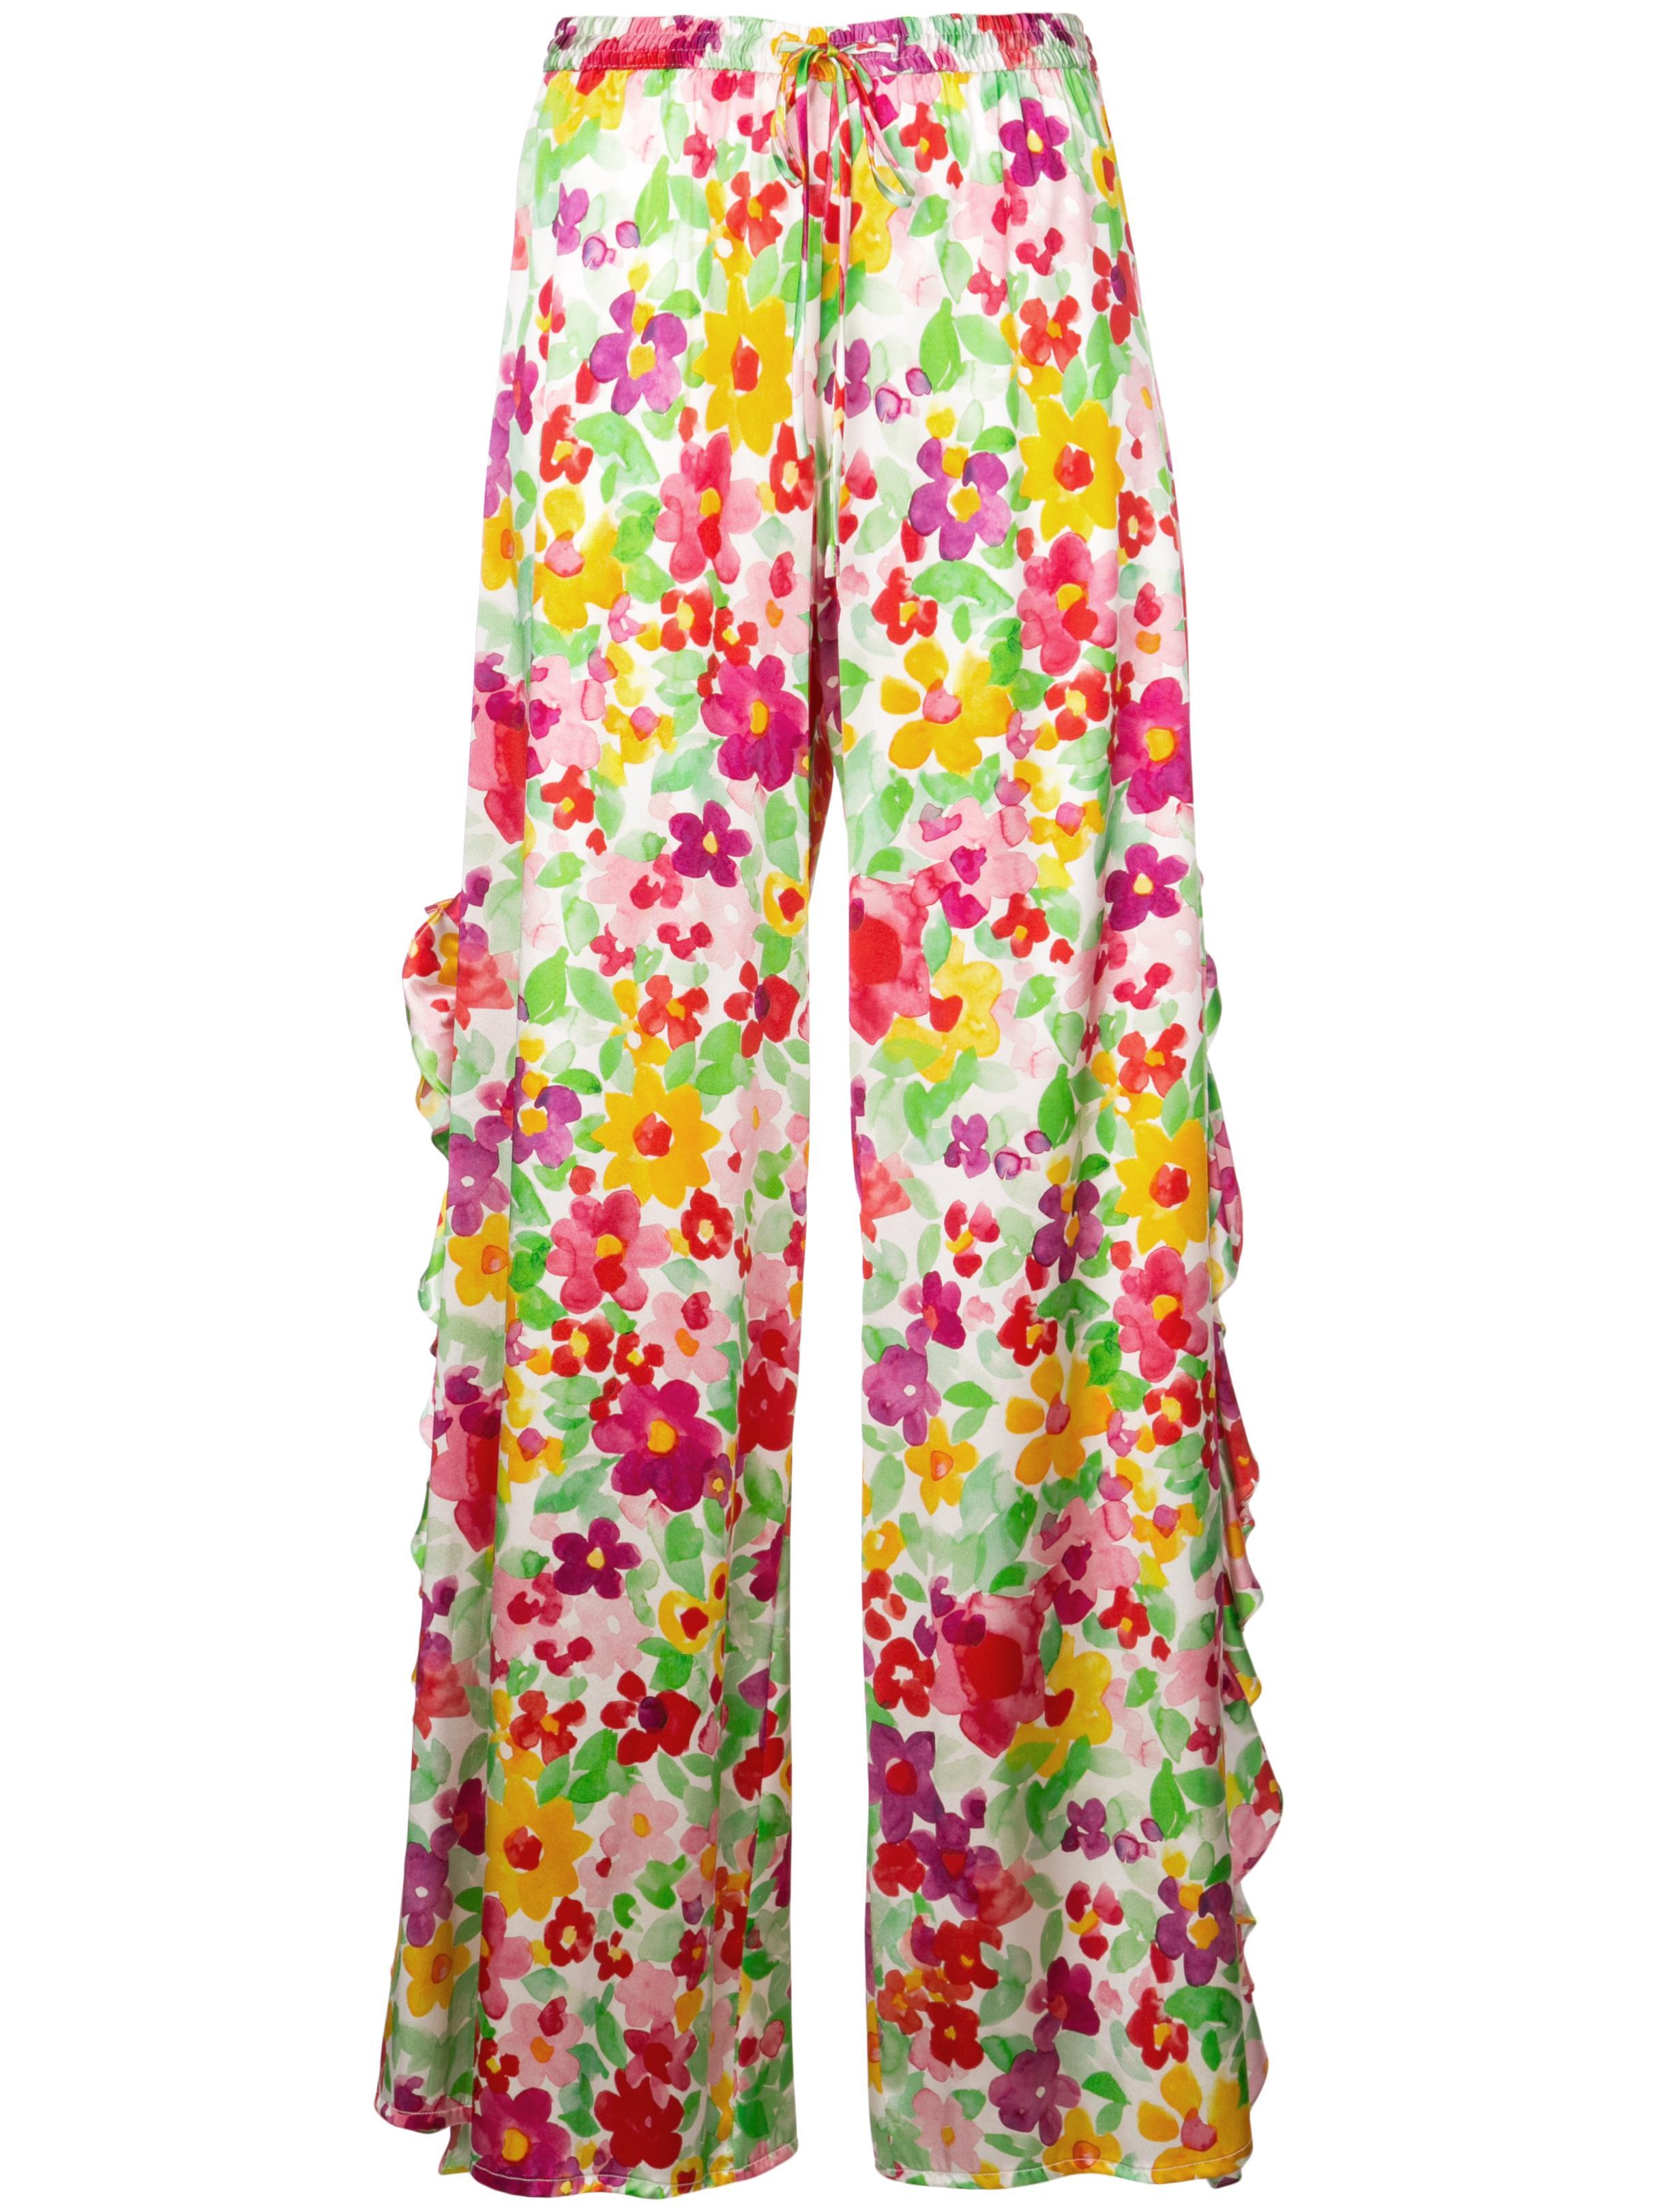 Floral Side Slit Ruffle Pant Item # P018FPS-S19